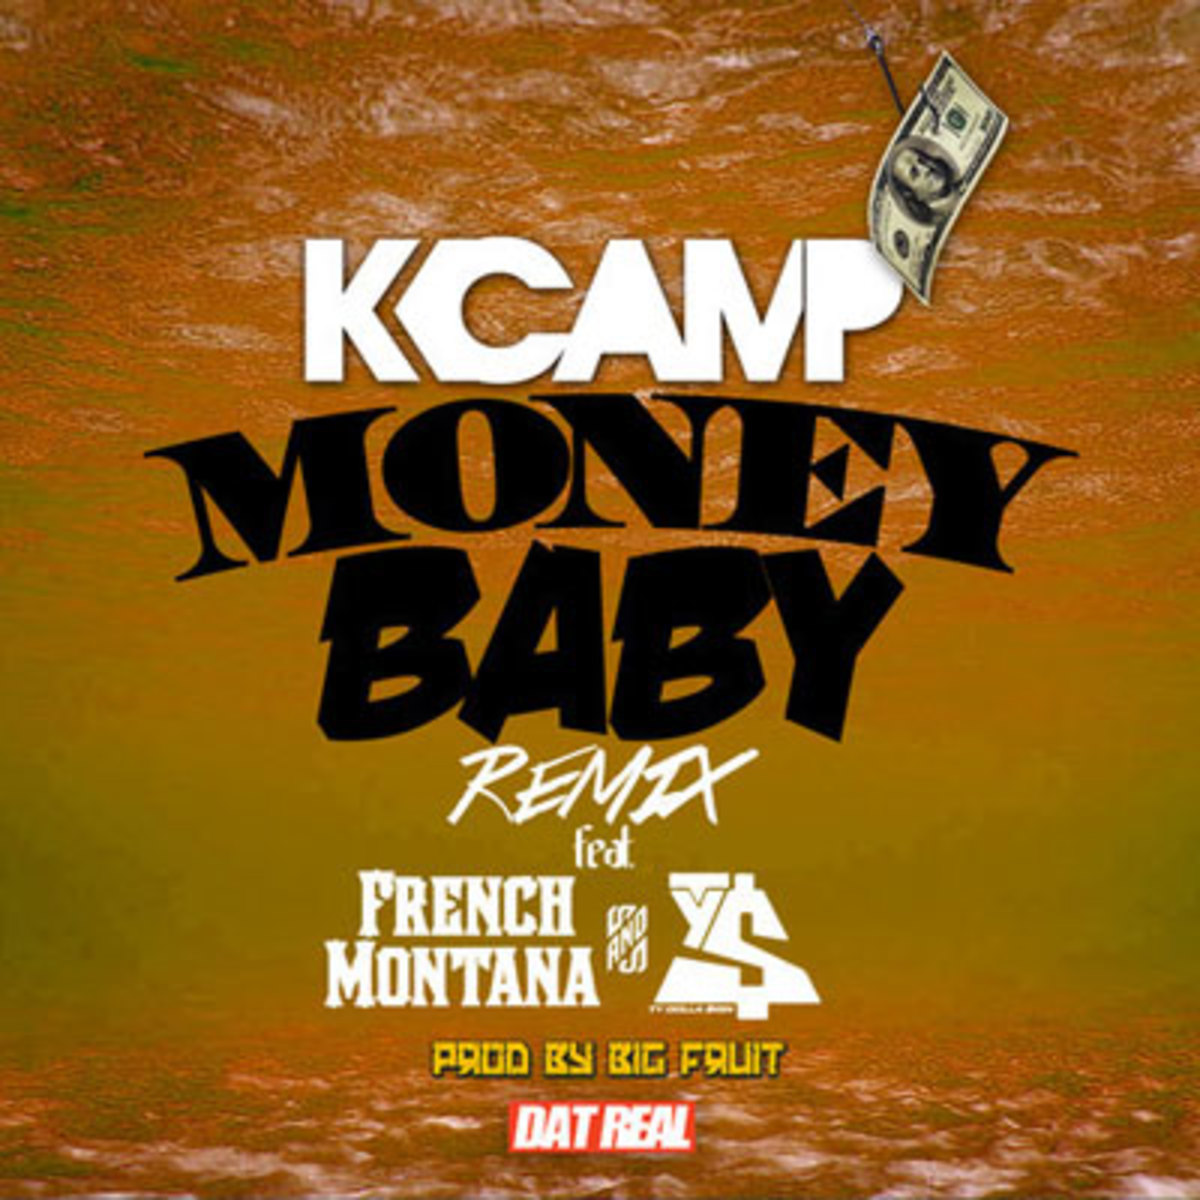 kcamp-moneybabyrmx.jpg